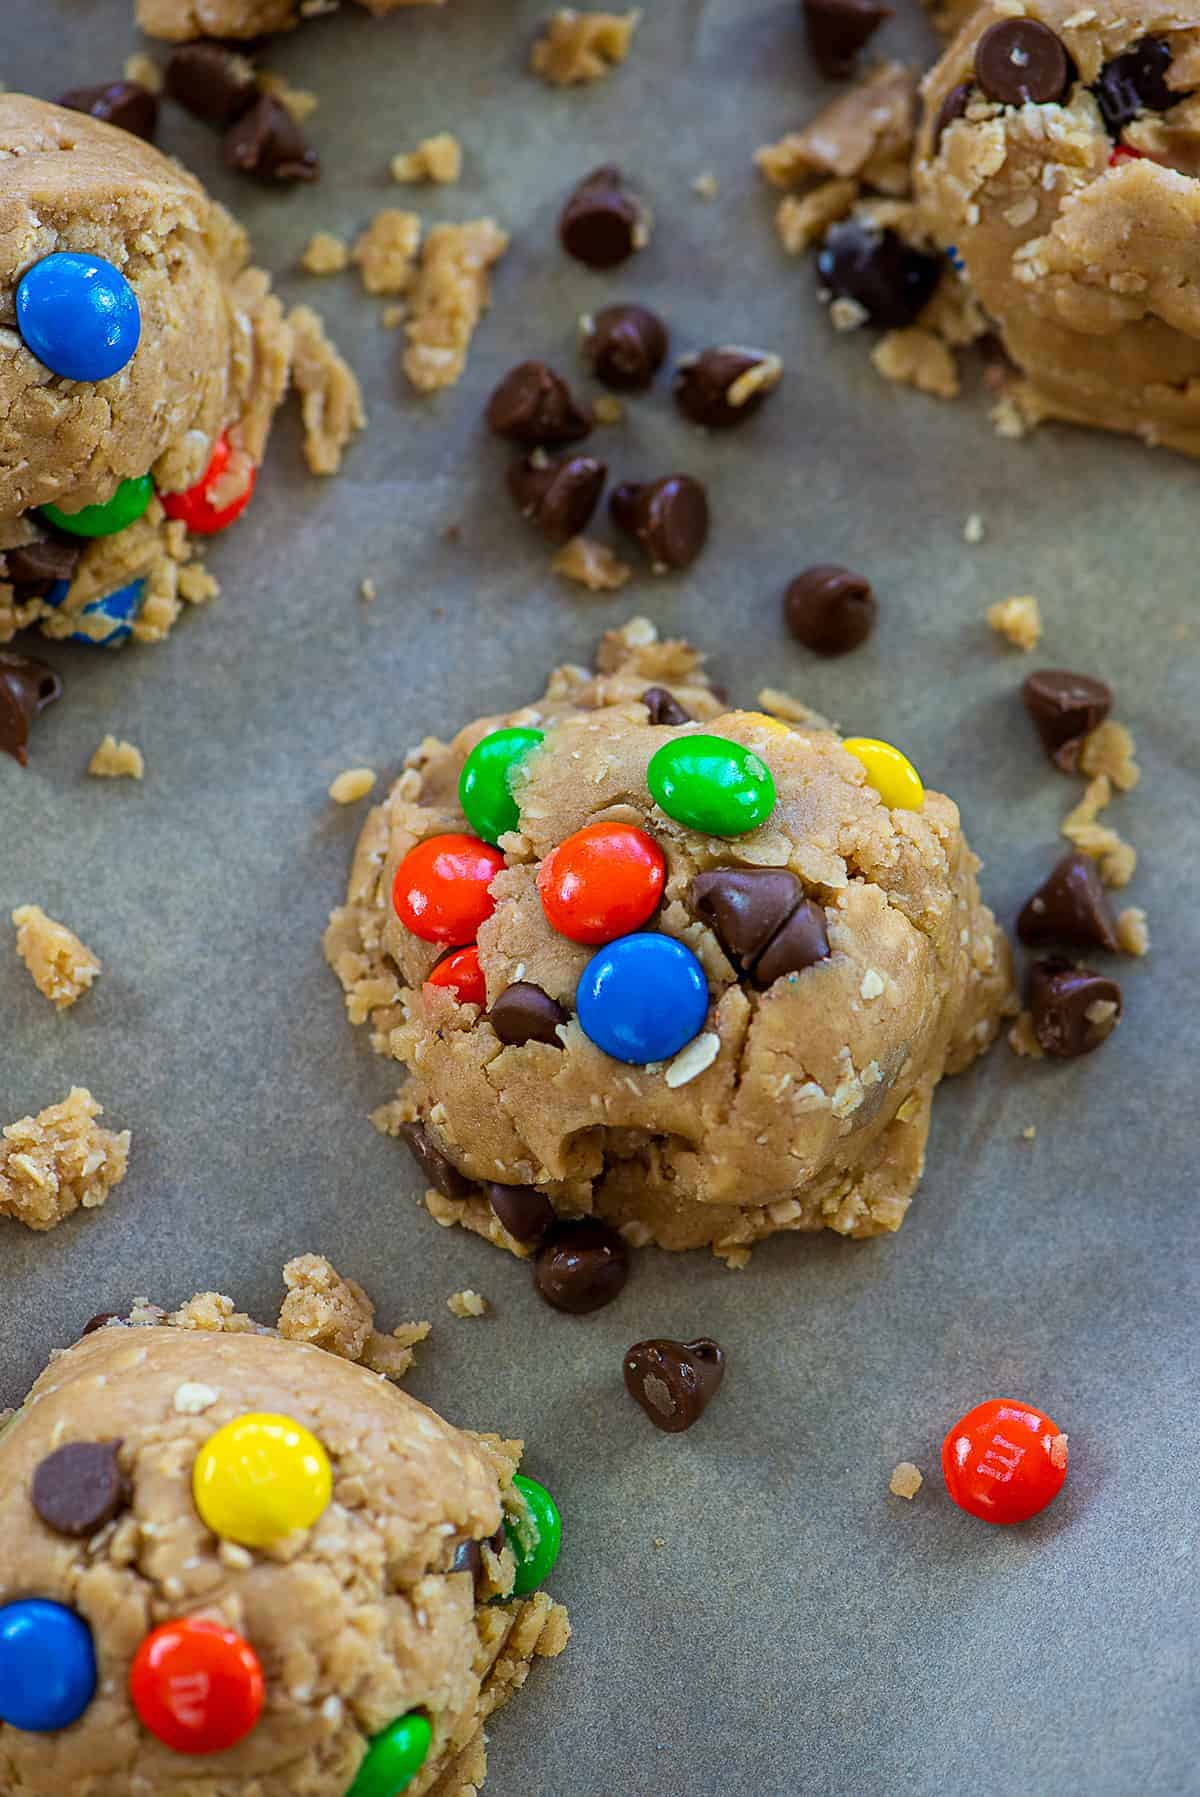 monster cookie dough on baking sheet.